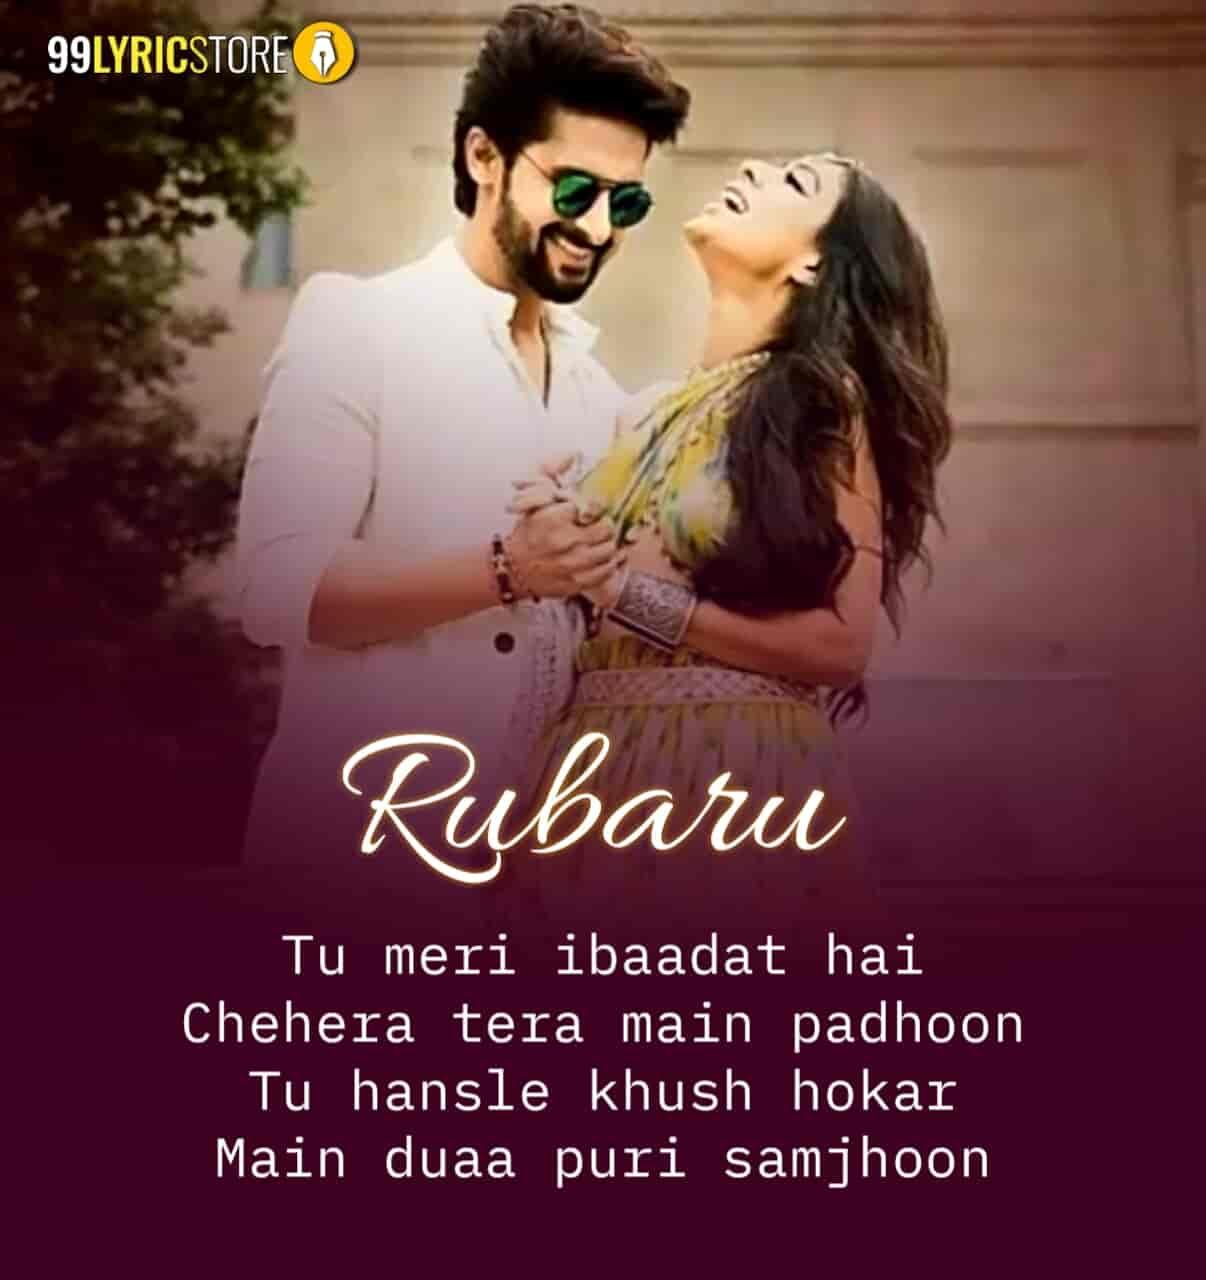 Rubaru Ravi Dubey Song Images